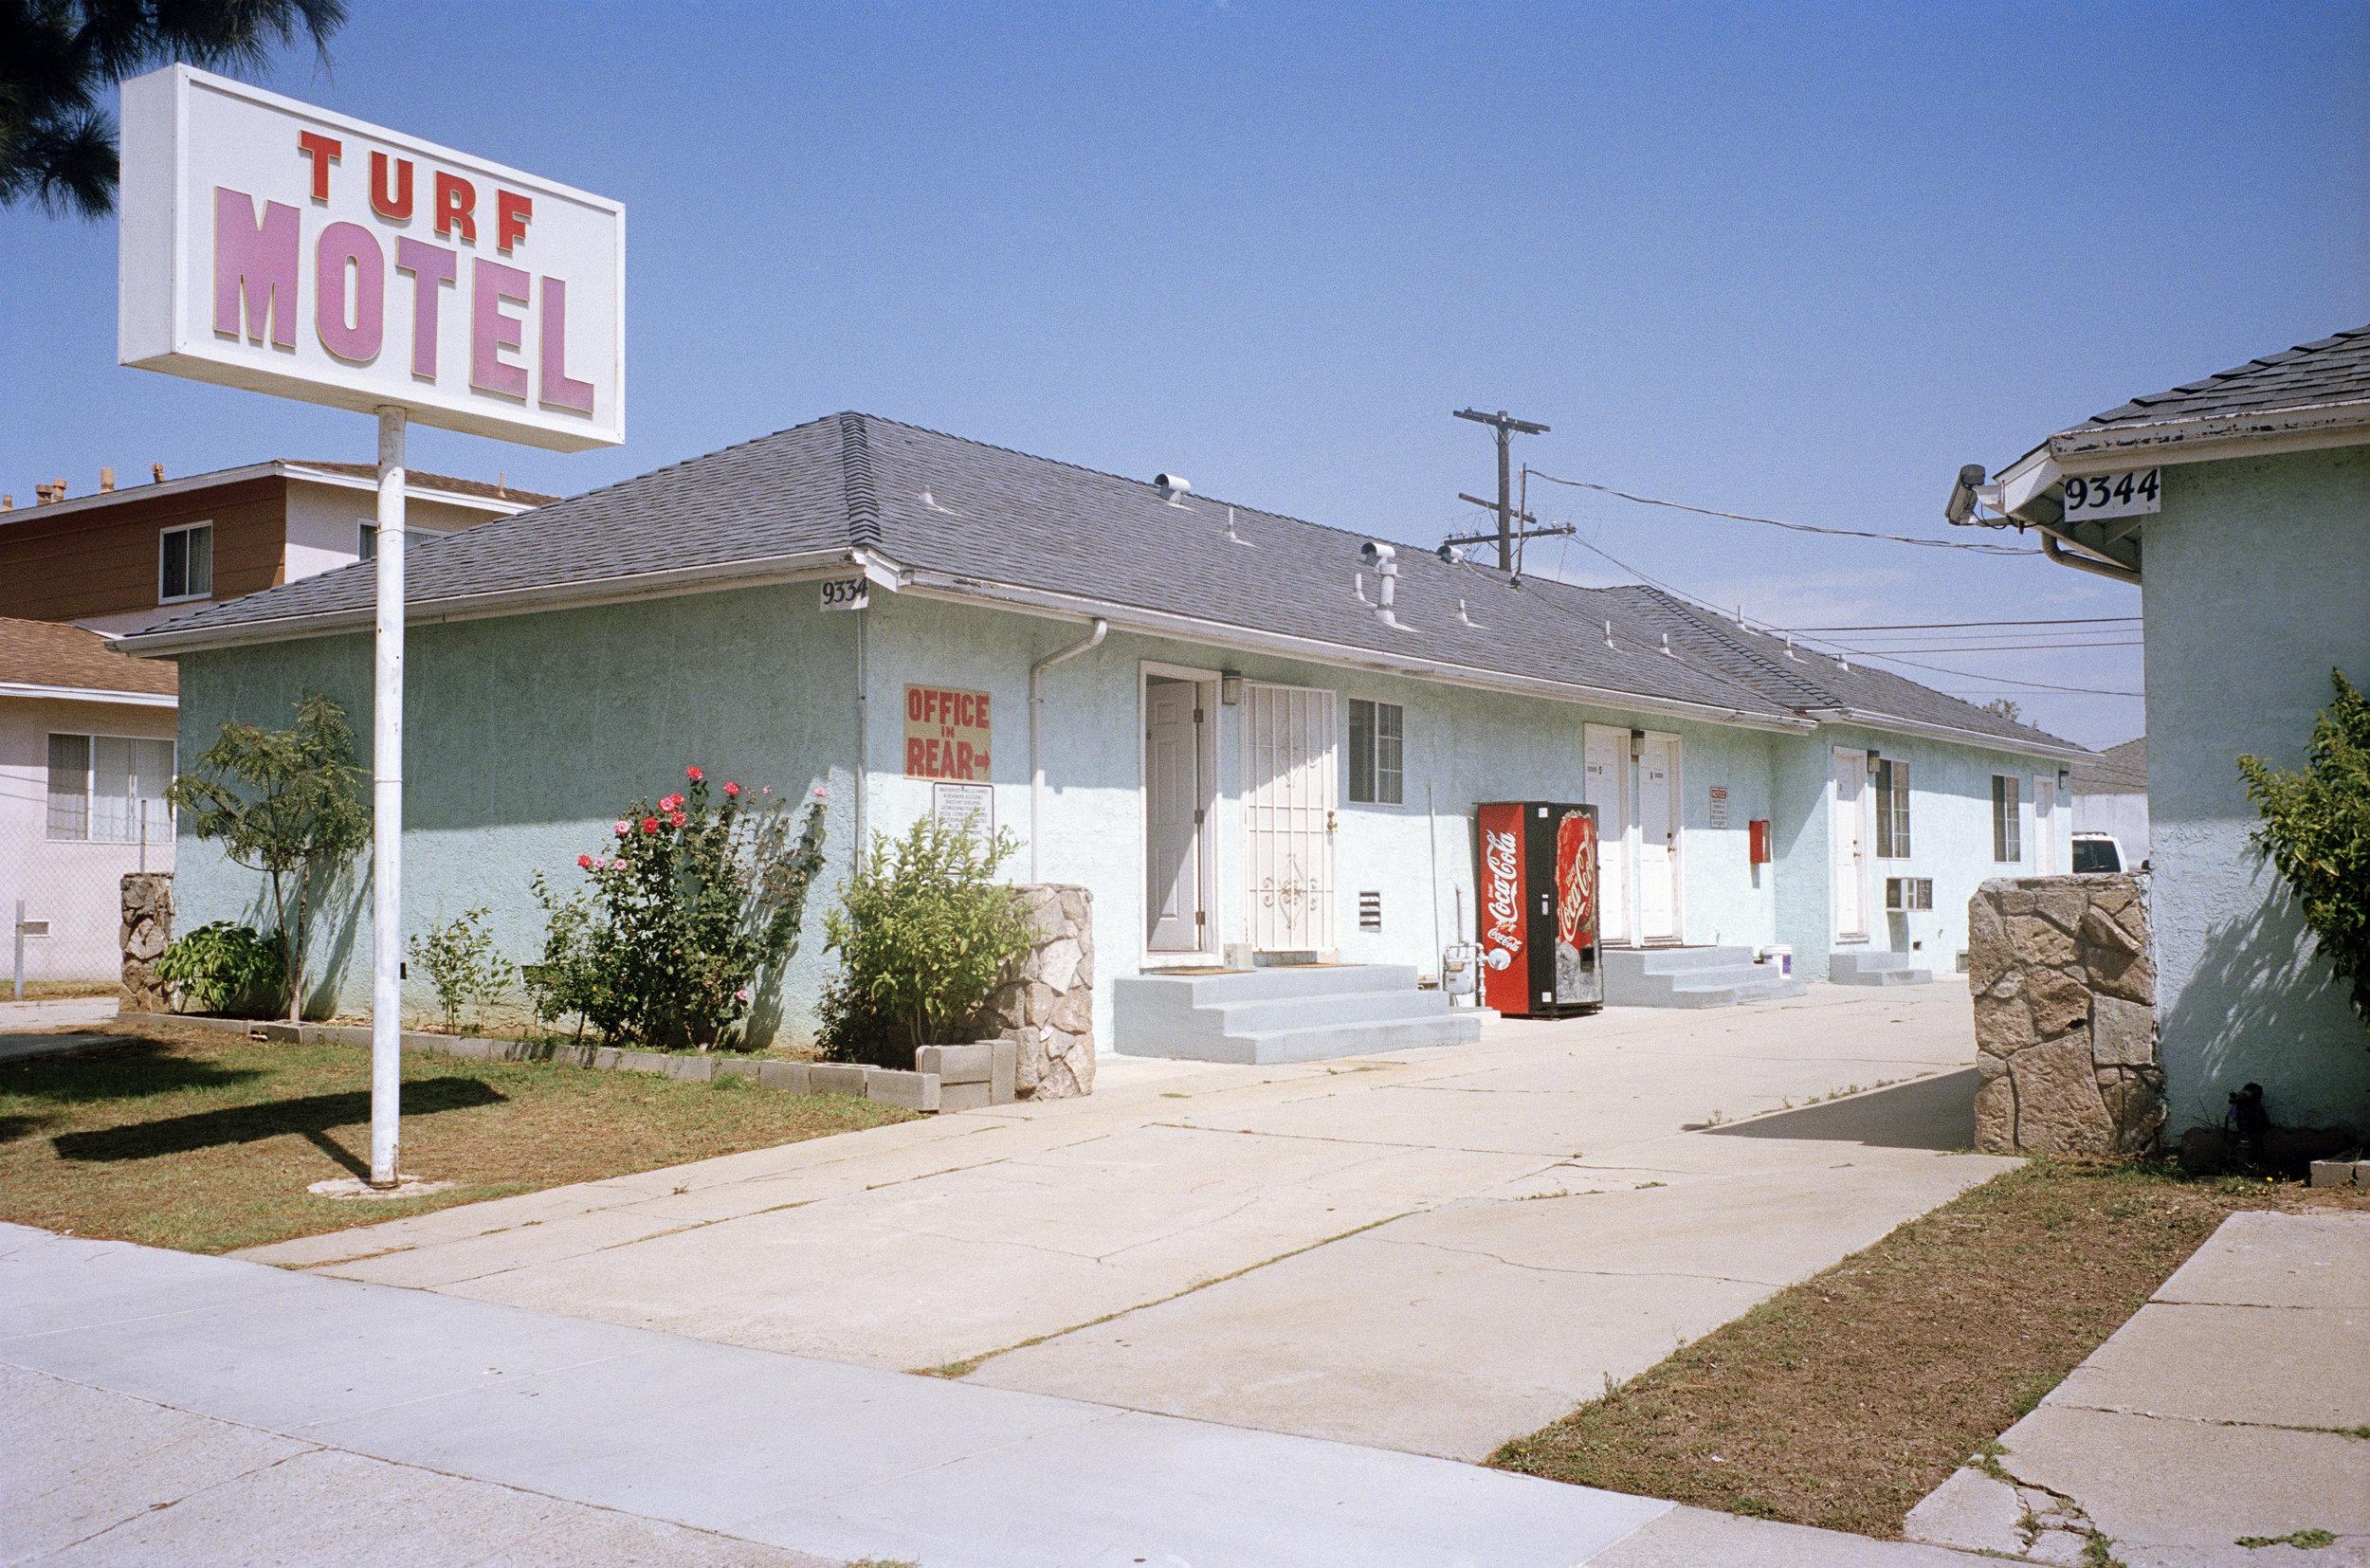 turf motel.jpg